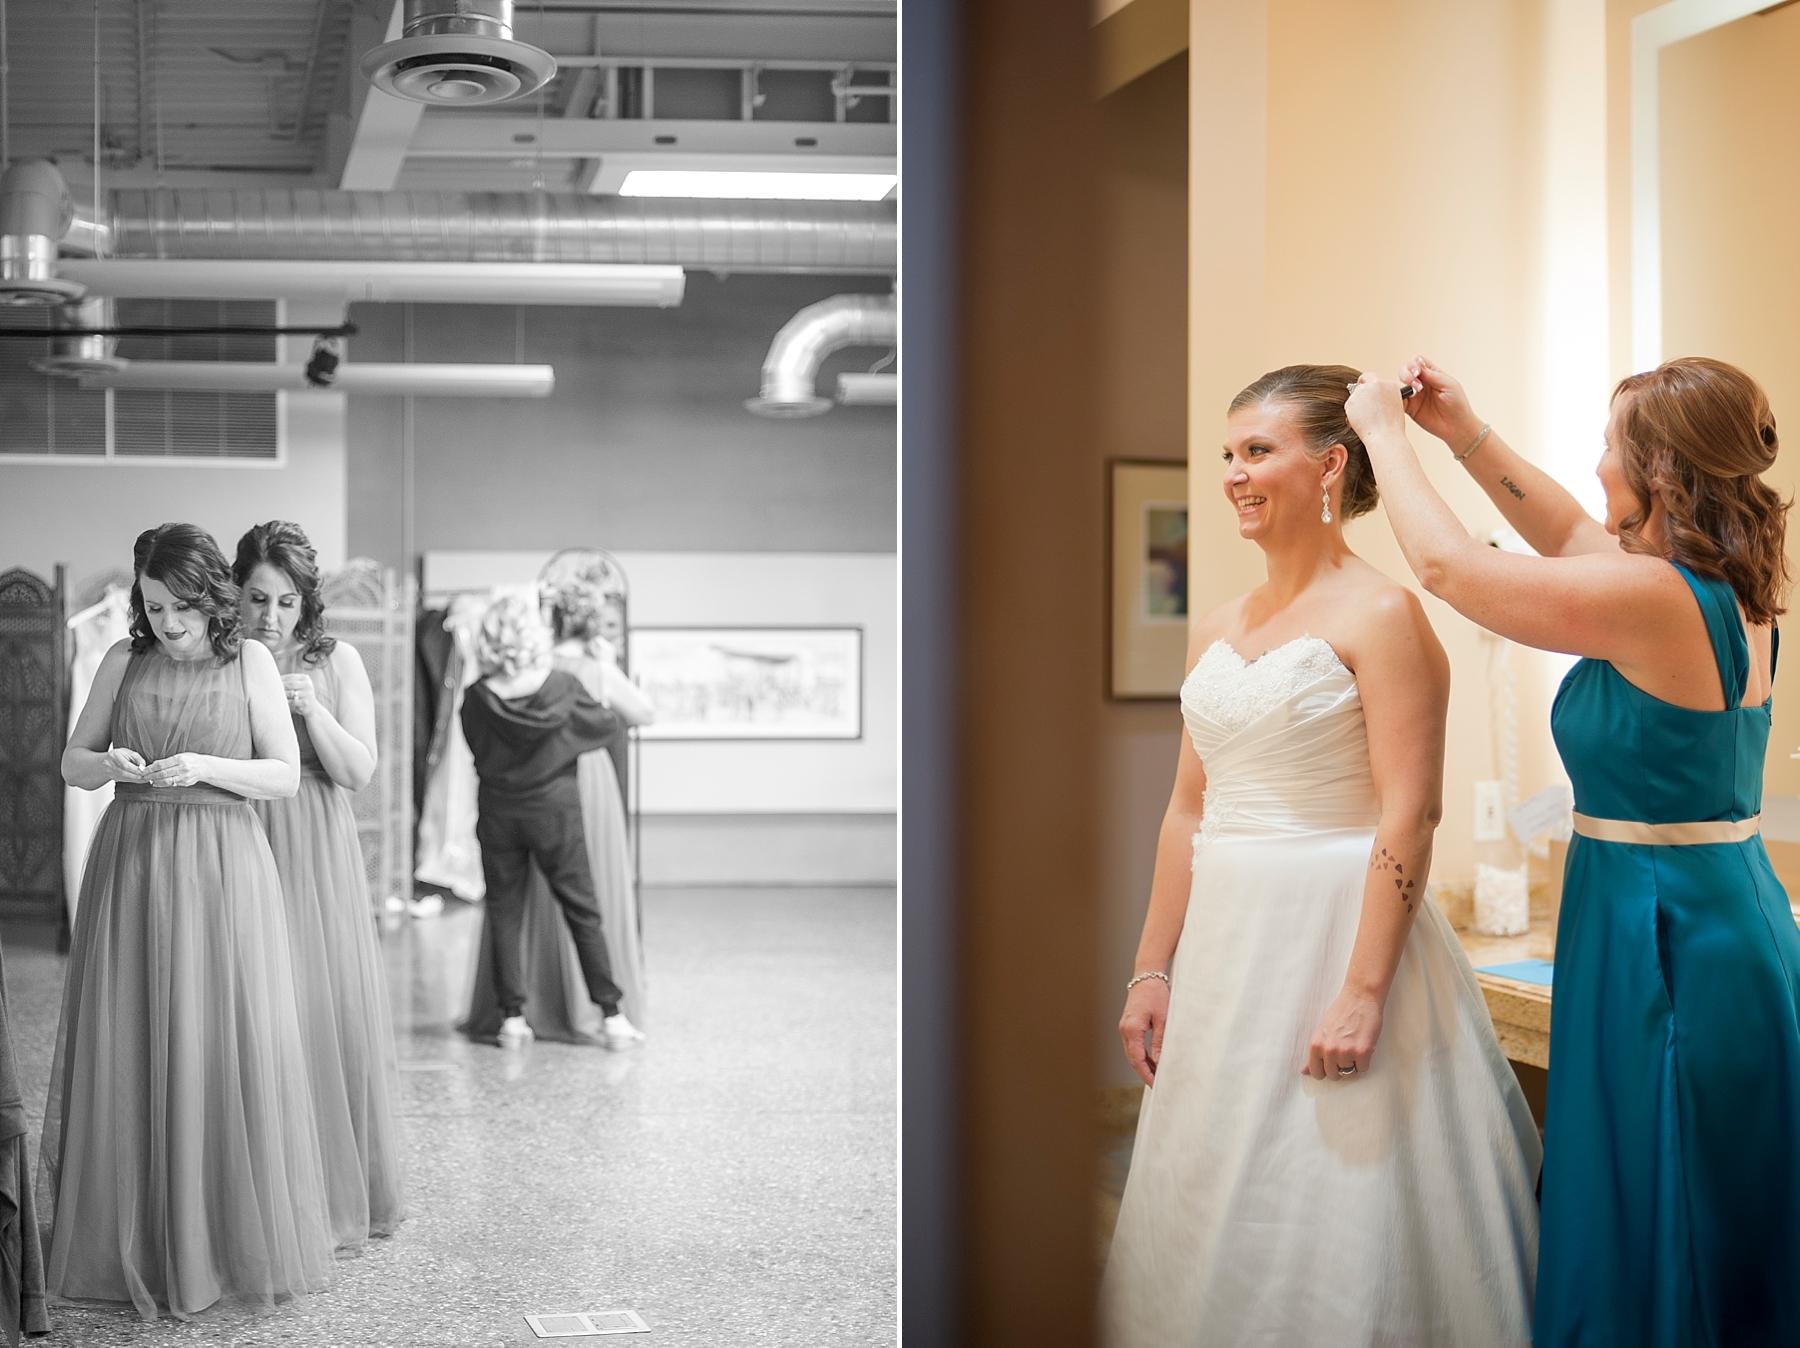 springs_preserve_las_vegas_wedding_photos-06.jpg